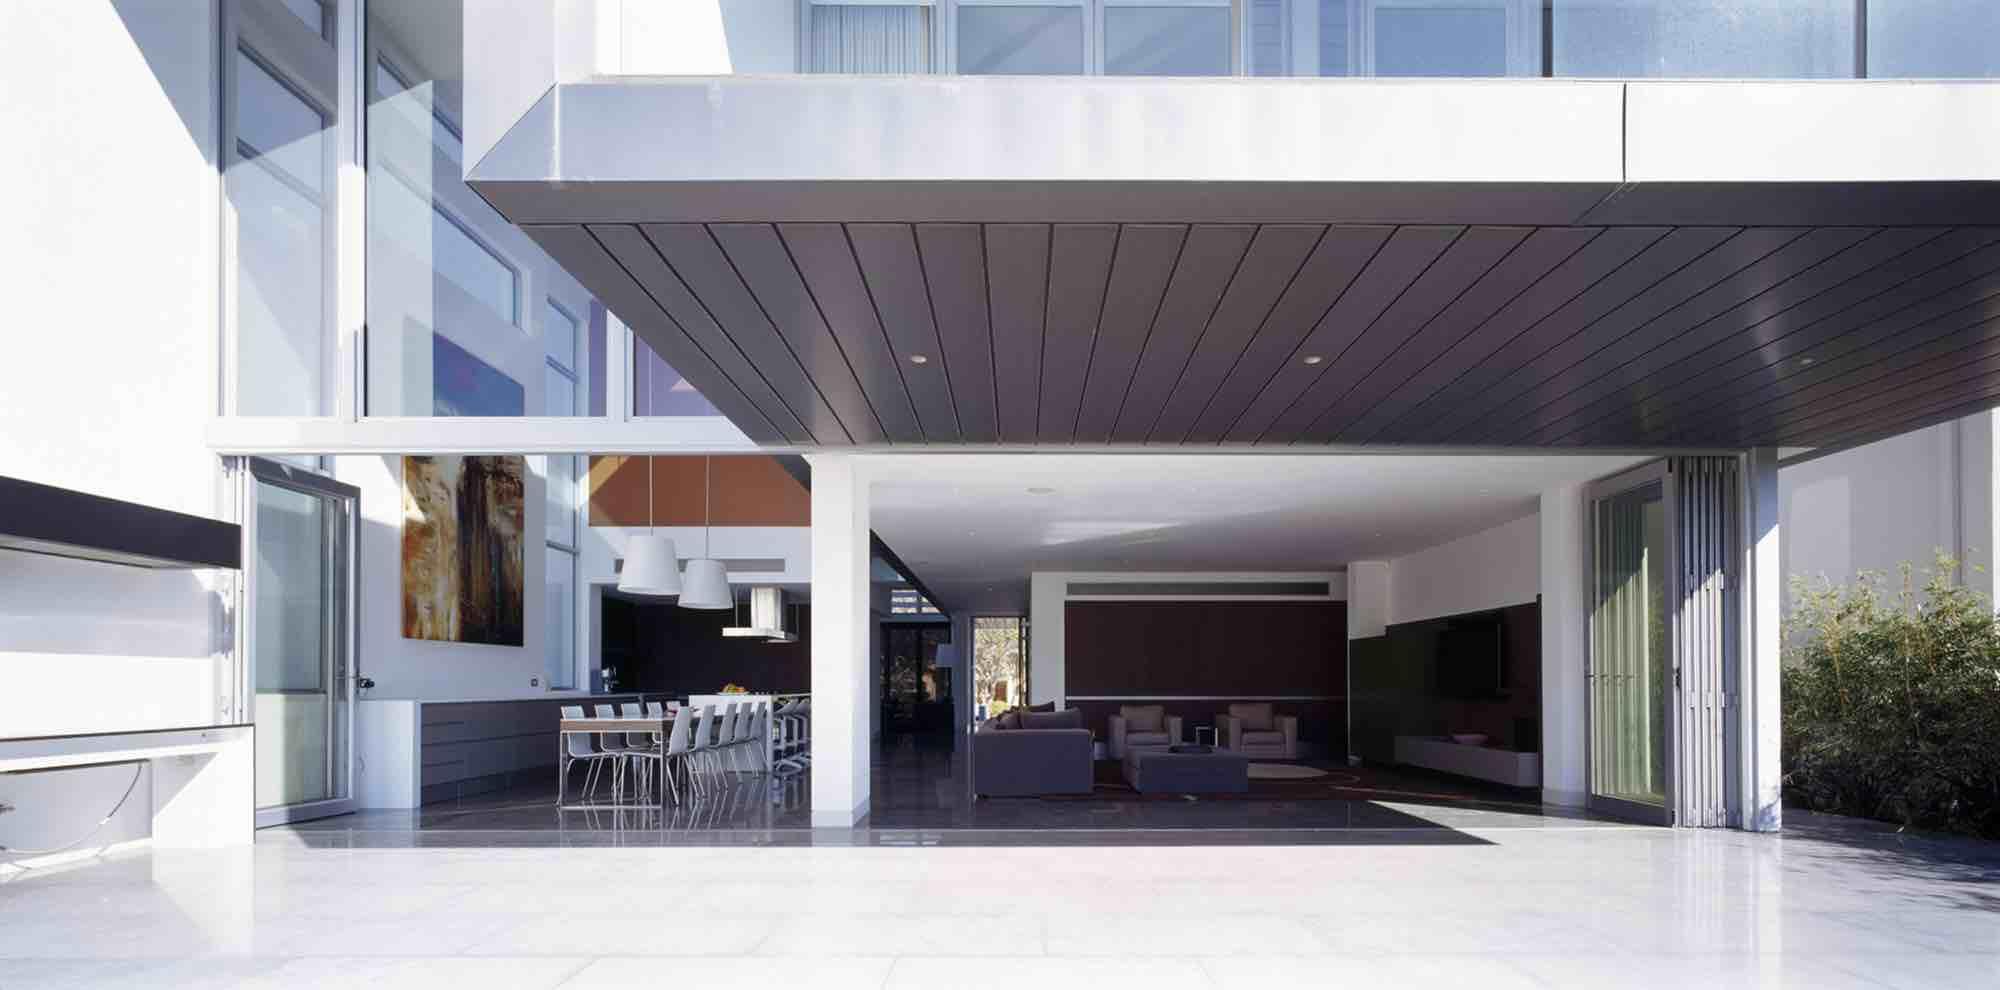 minosa-design-open-plan-high-ceiling-void-large-dinning-table-corian-benchtop-minosa-kitchen-gilda-cantilever-03